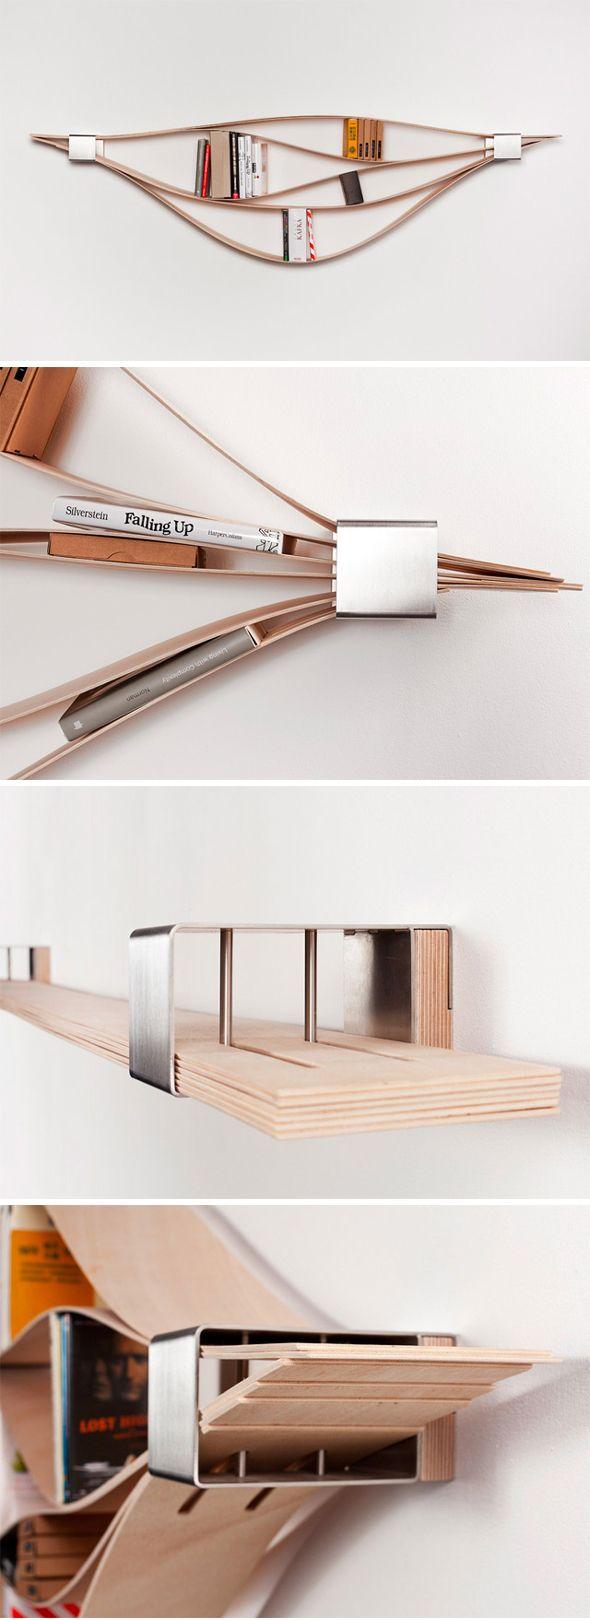 17 meilleures id es propos de tag res murales sur. Black Bedroom Furniture Sets. Home Design Ideas